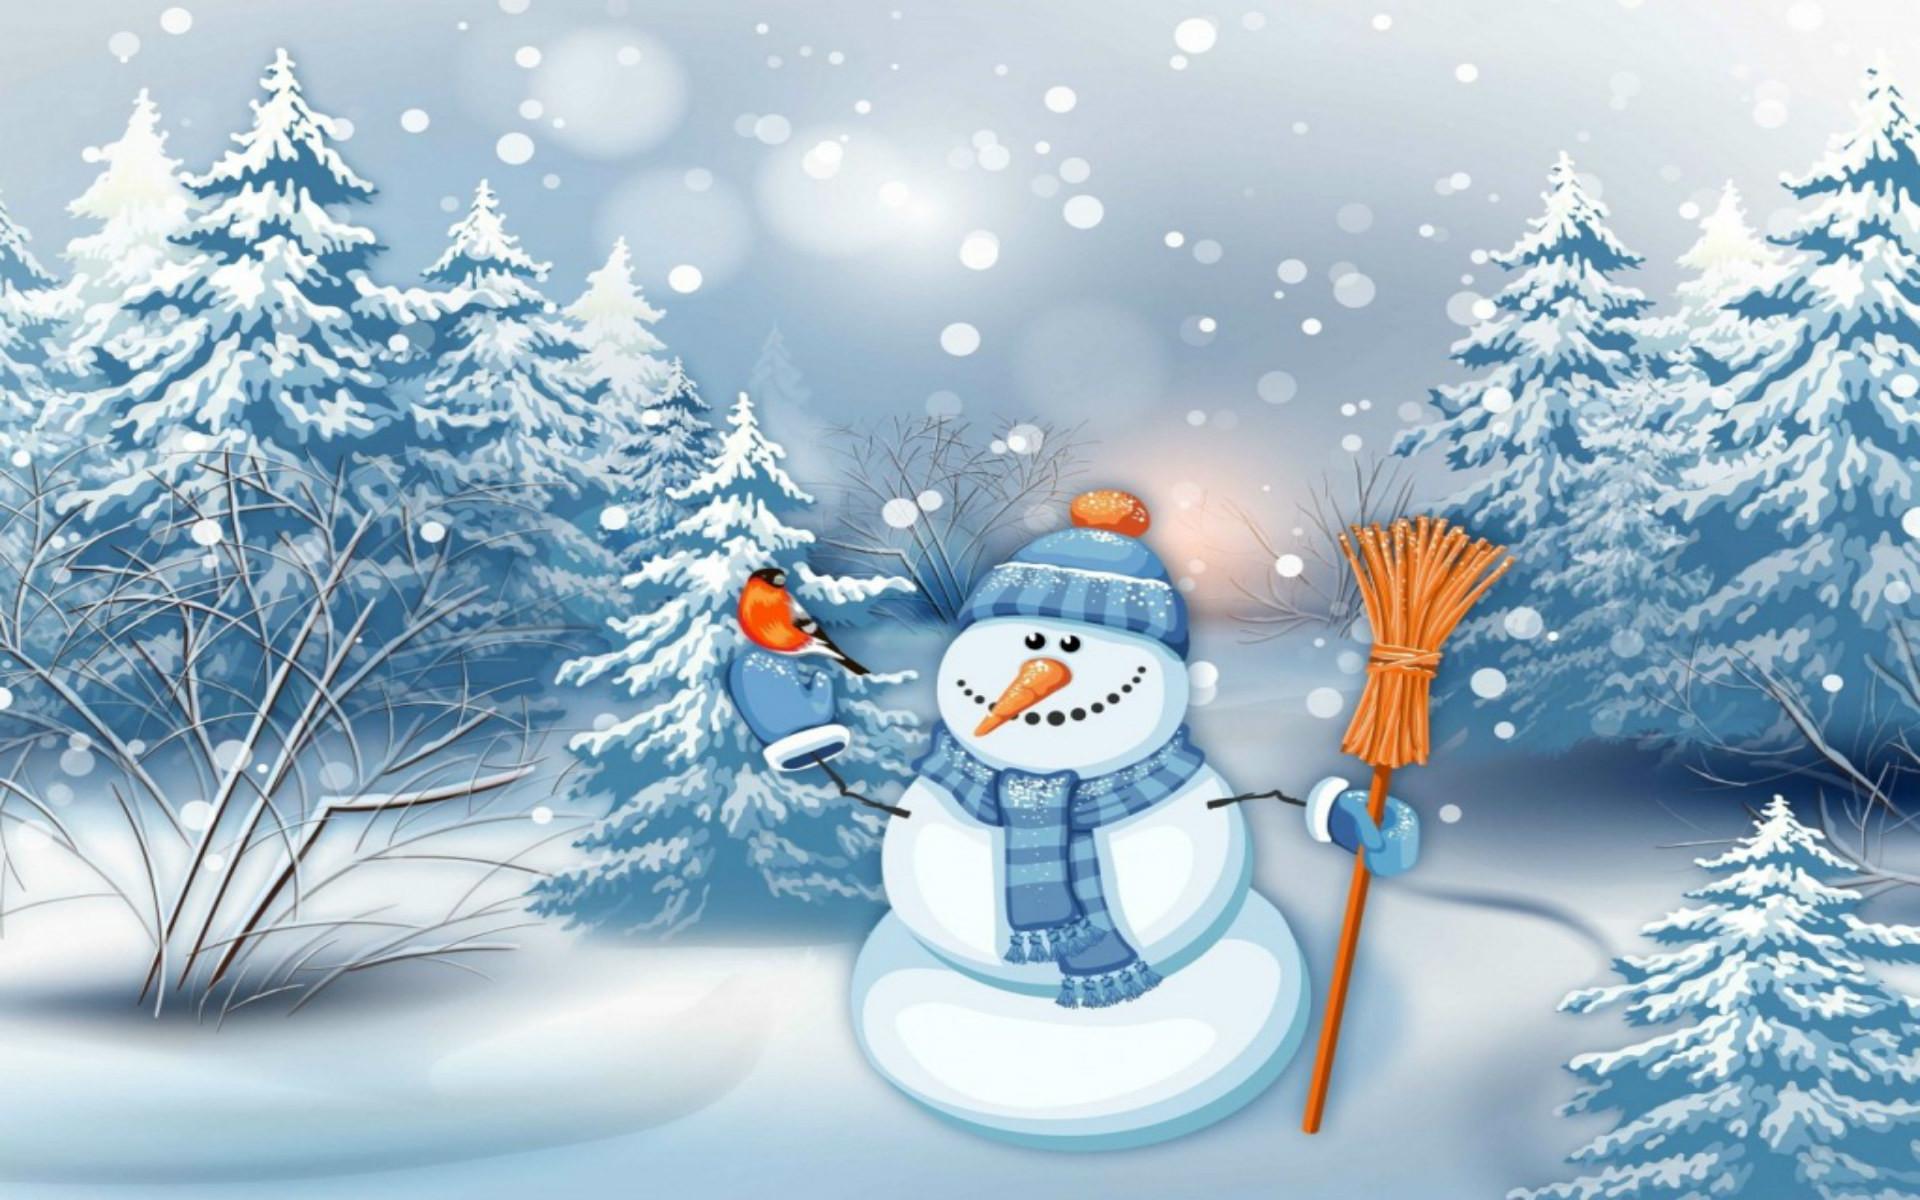 snowman desktop wallpaper 59 images